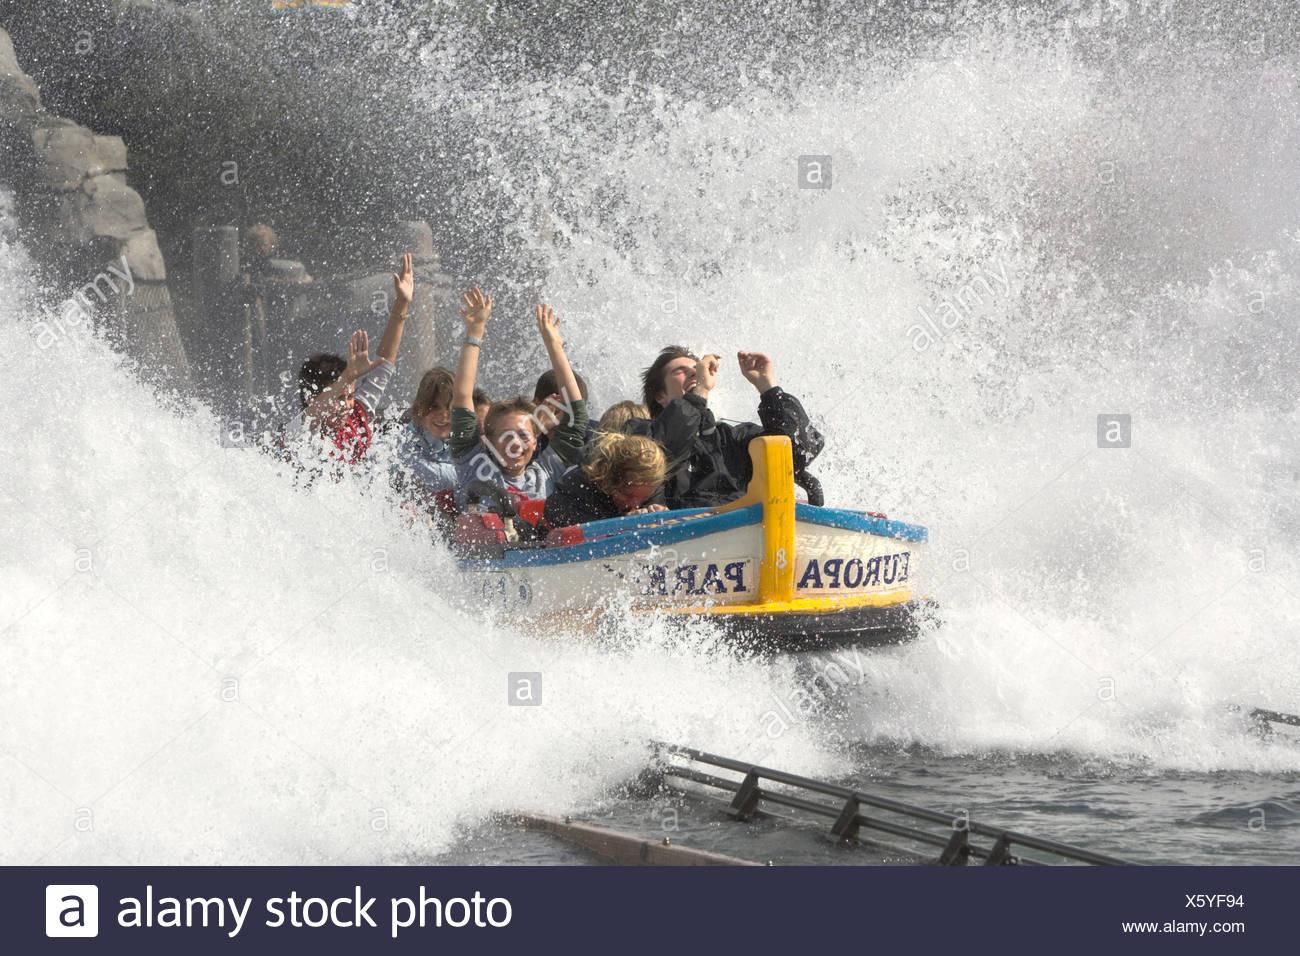 Water roller coaster poseidon, Europa park Rust, Bade-Wuerttemberg, Germany - Stock Image